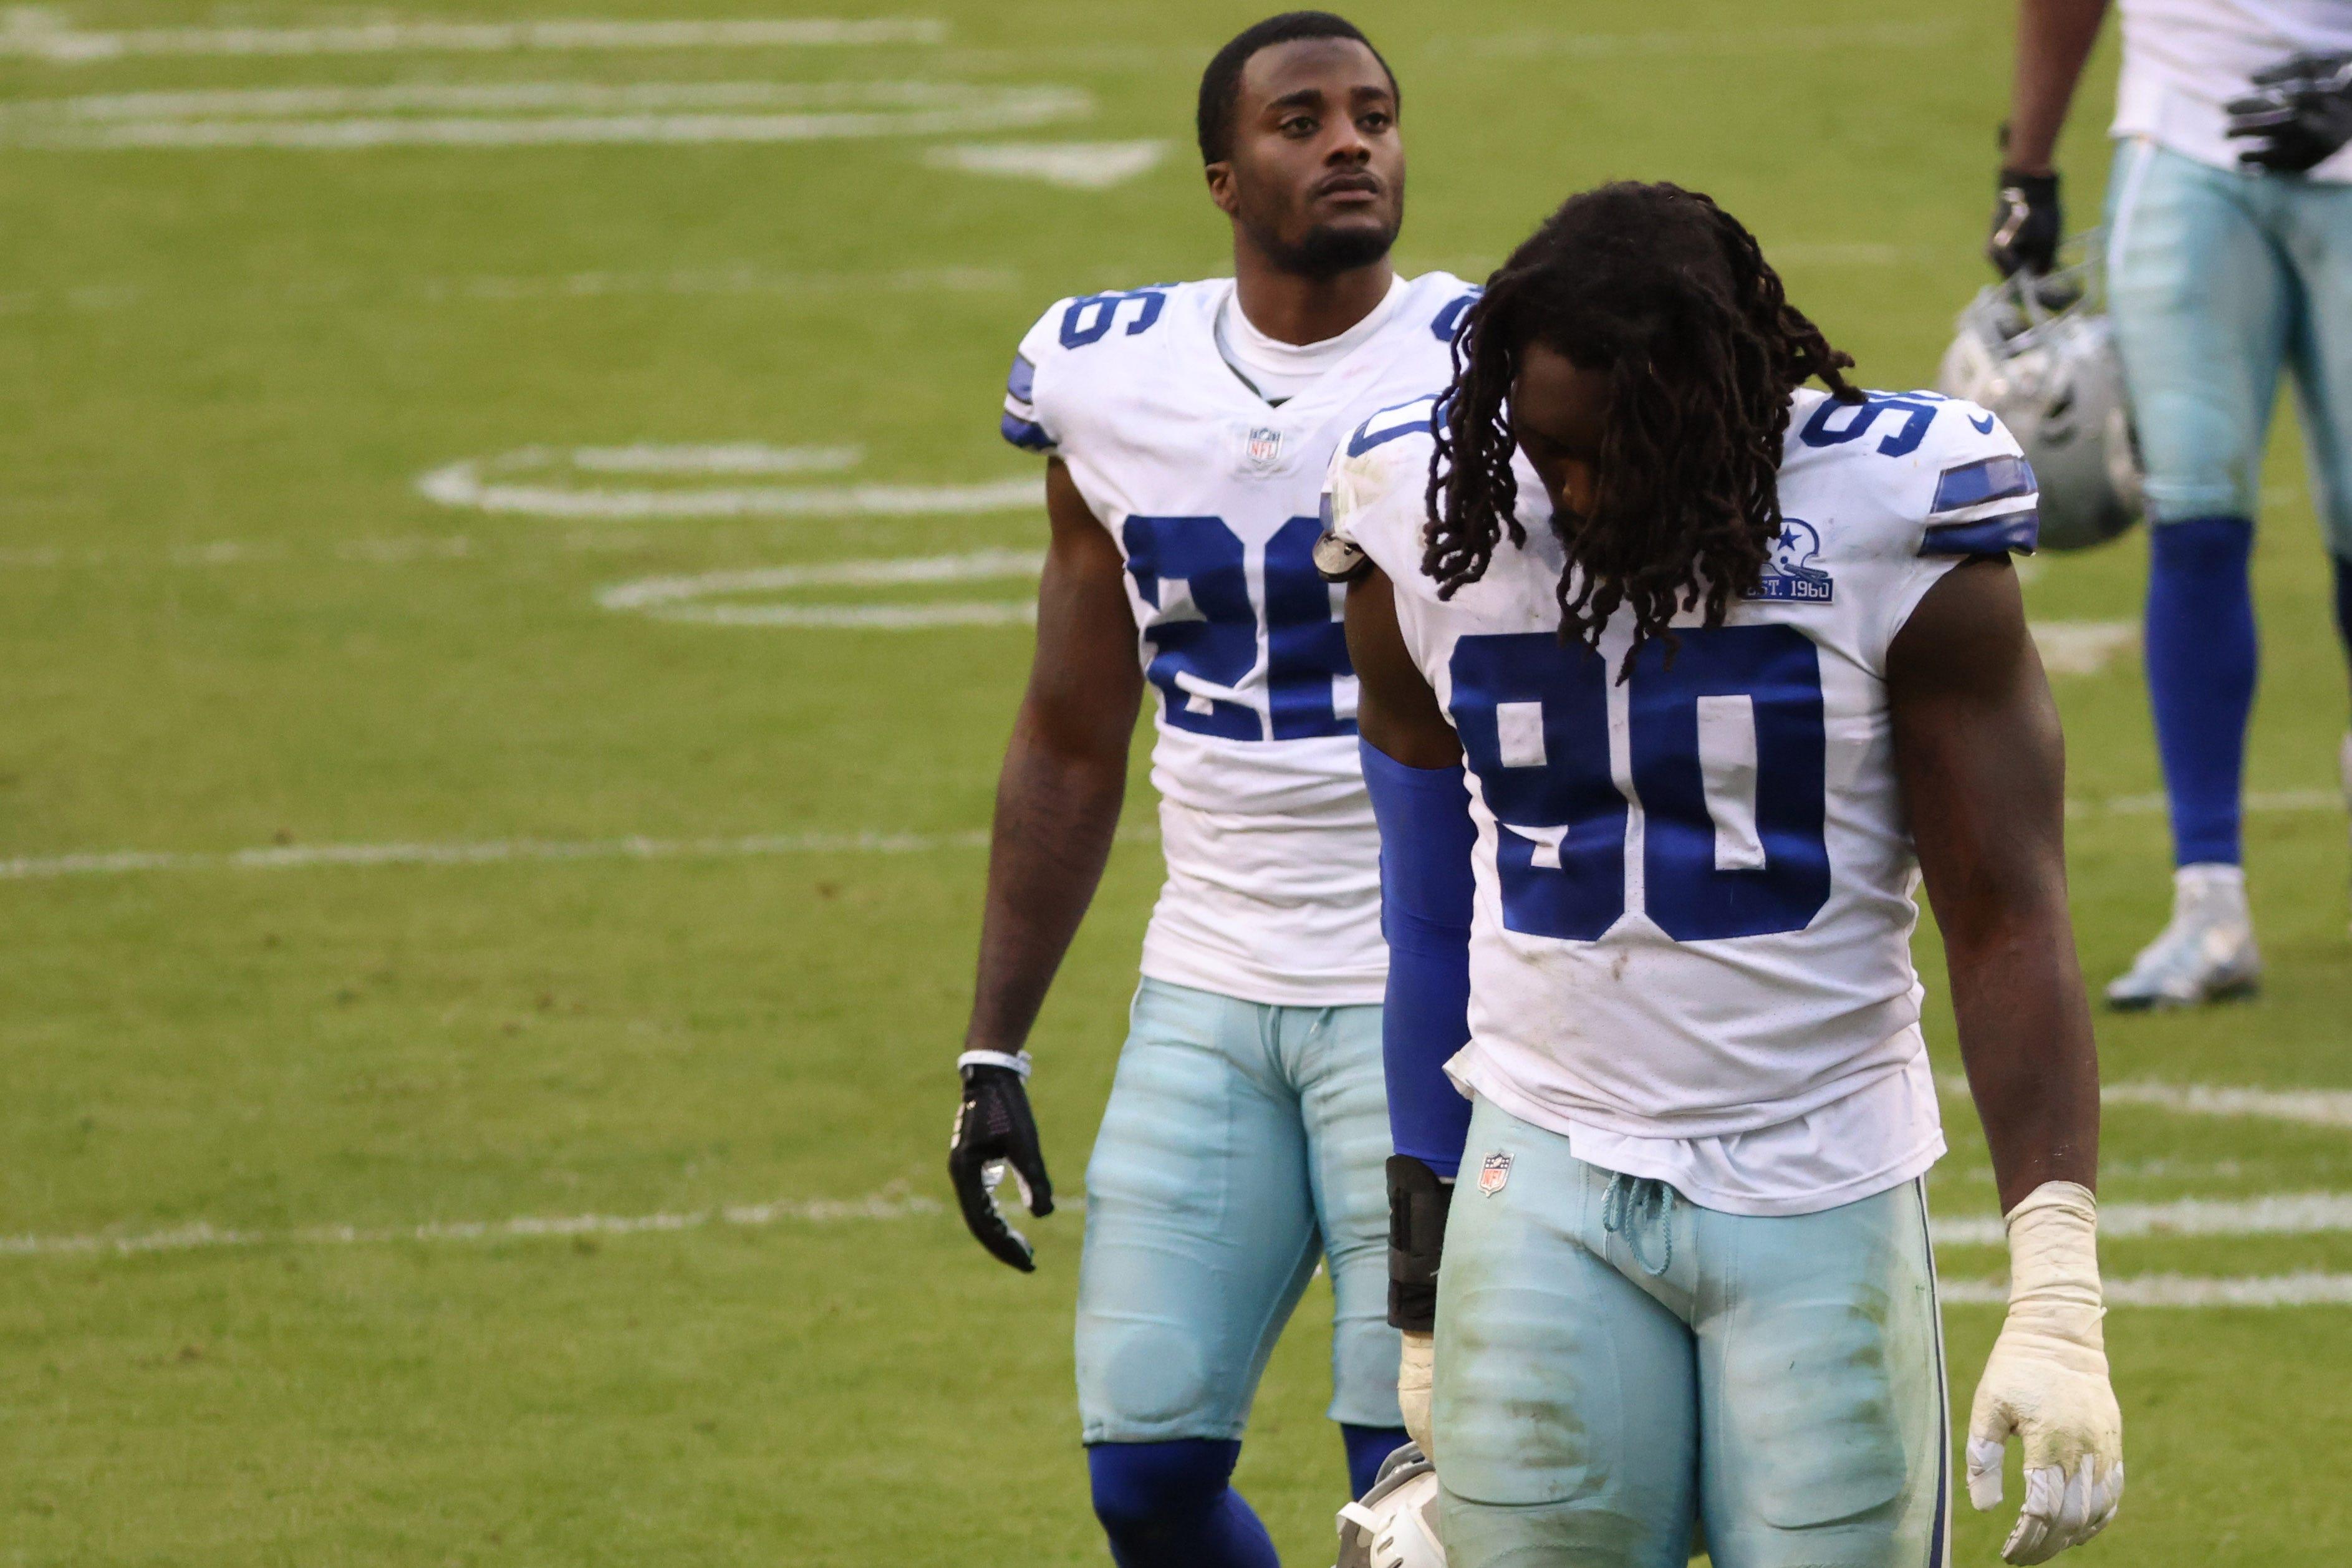 Dallas Cowboys: DeMarcus Ware reveals 'telltale' sign for improvement